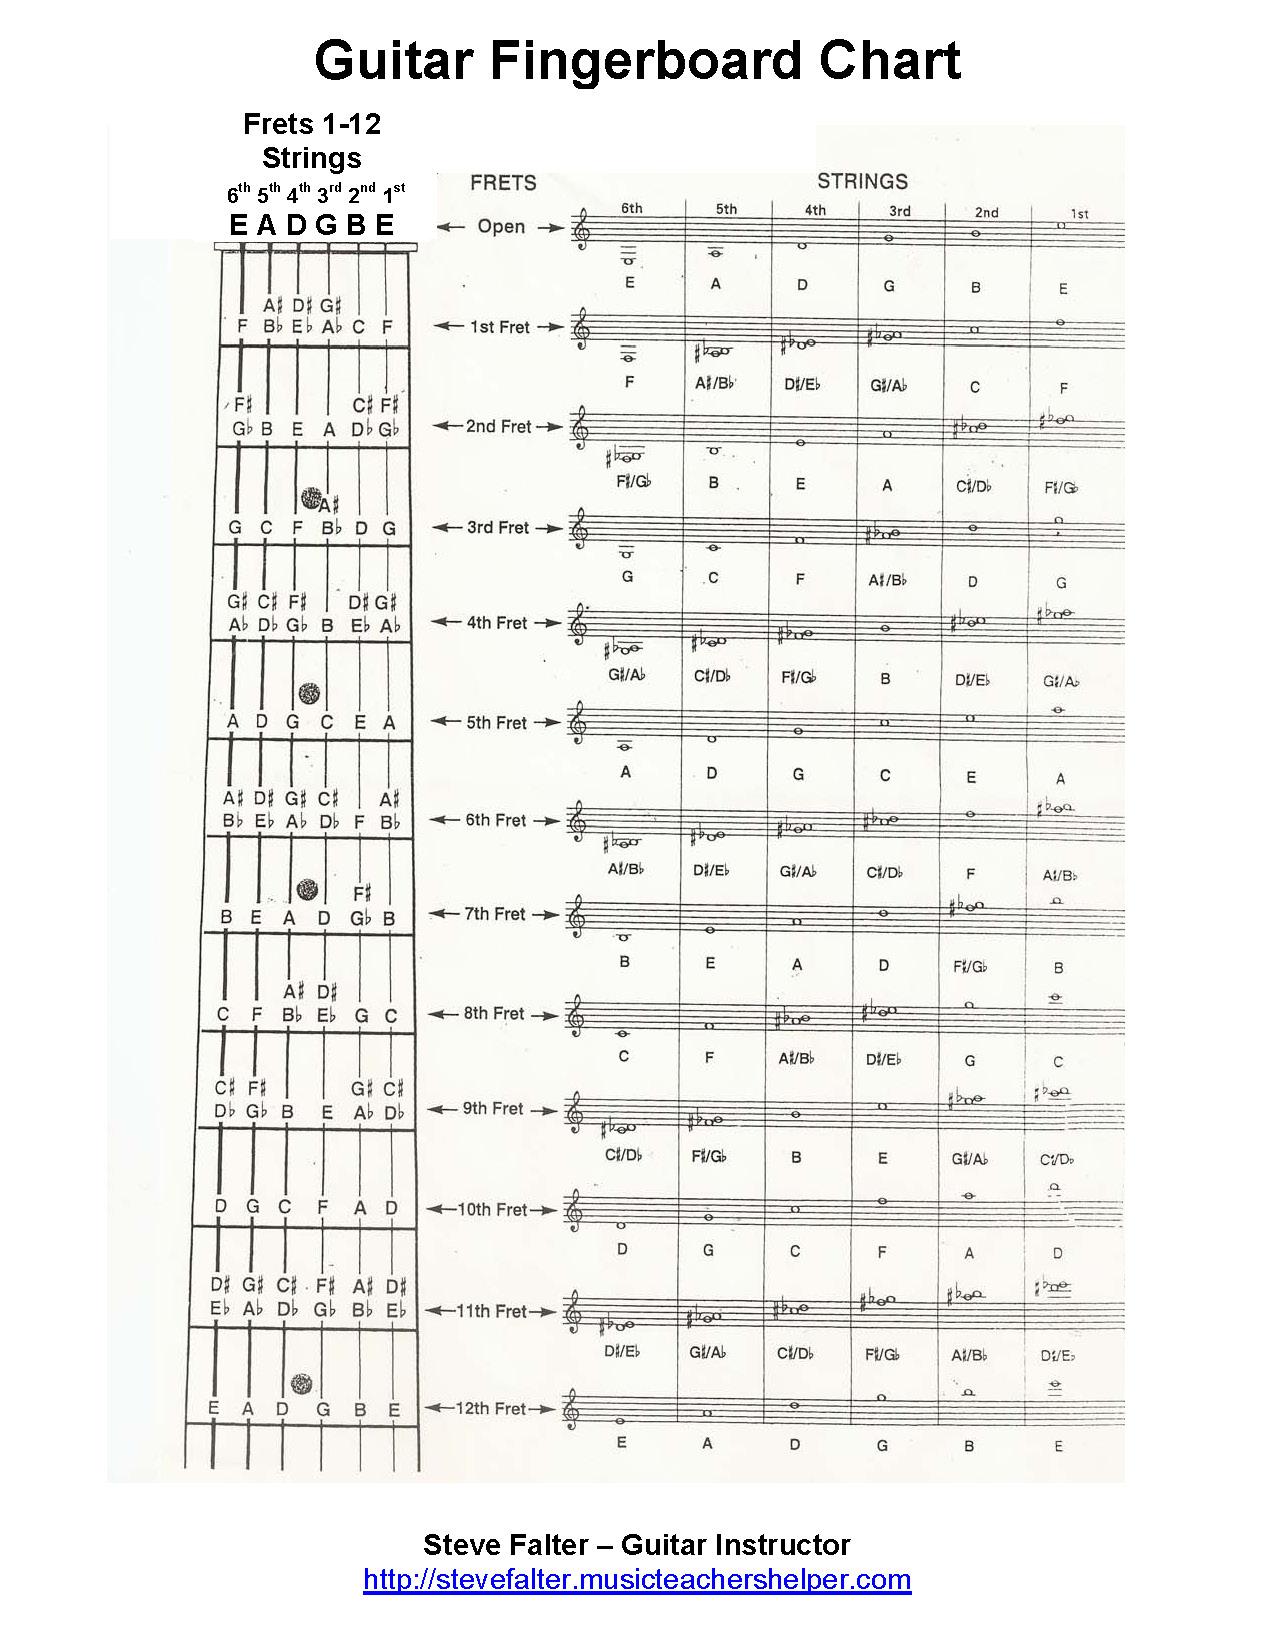 Capo chords